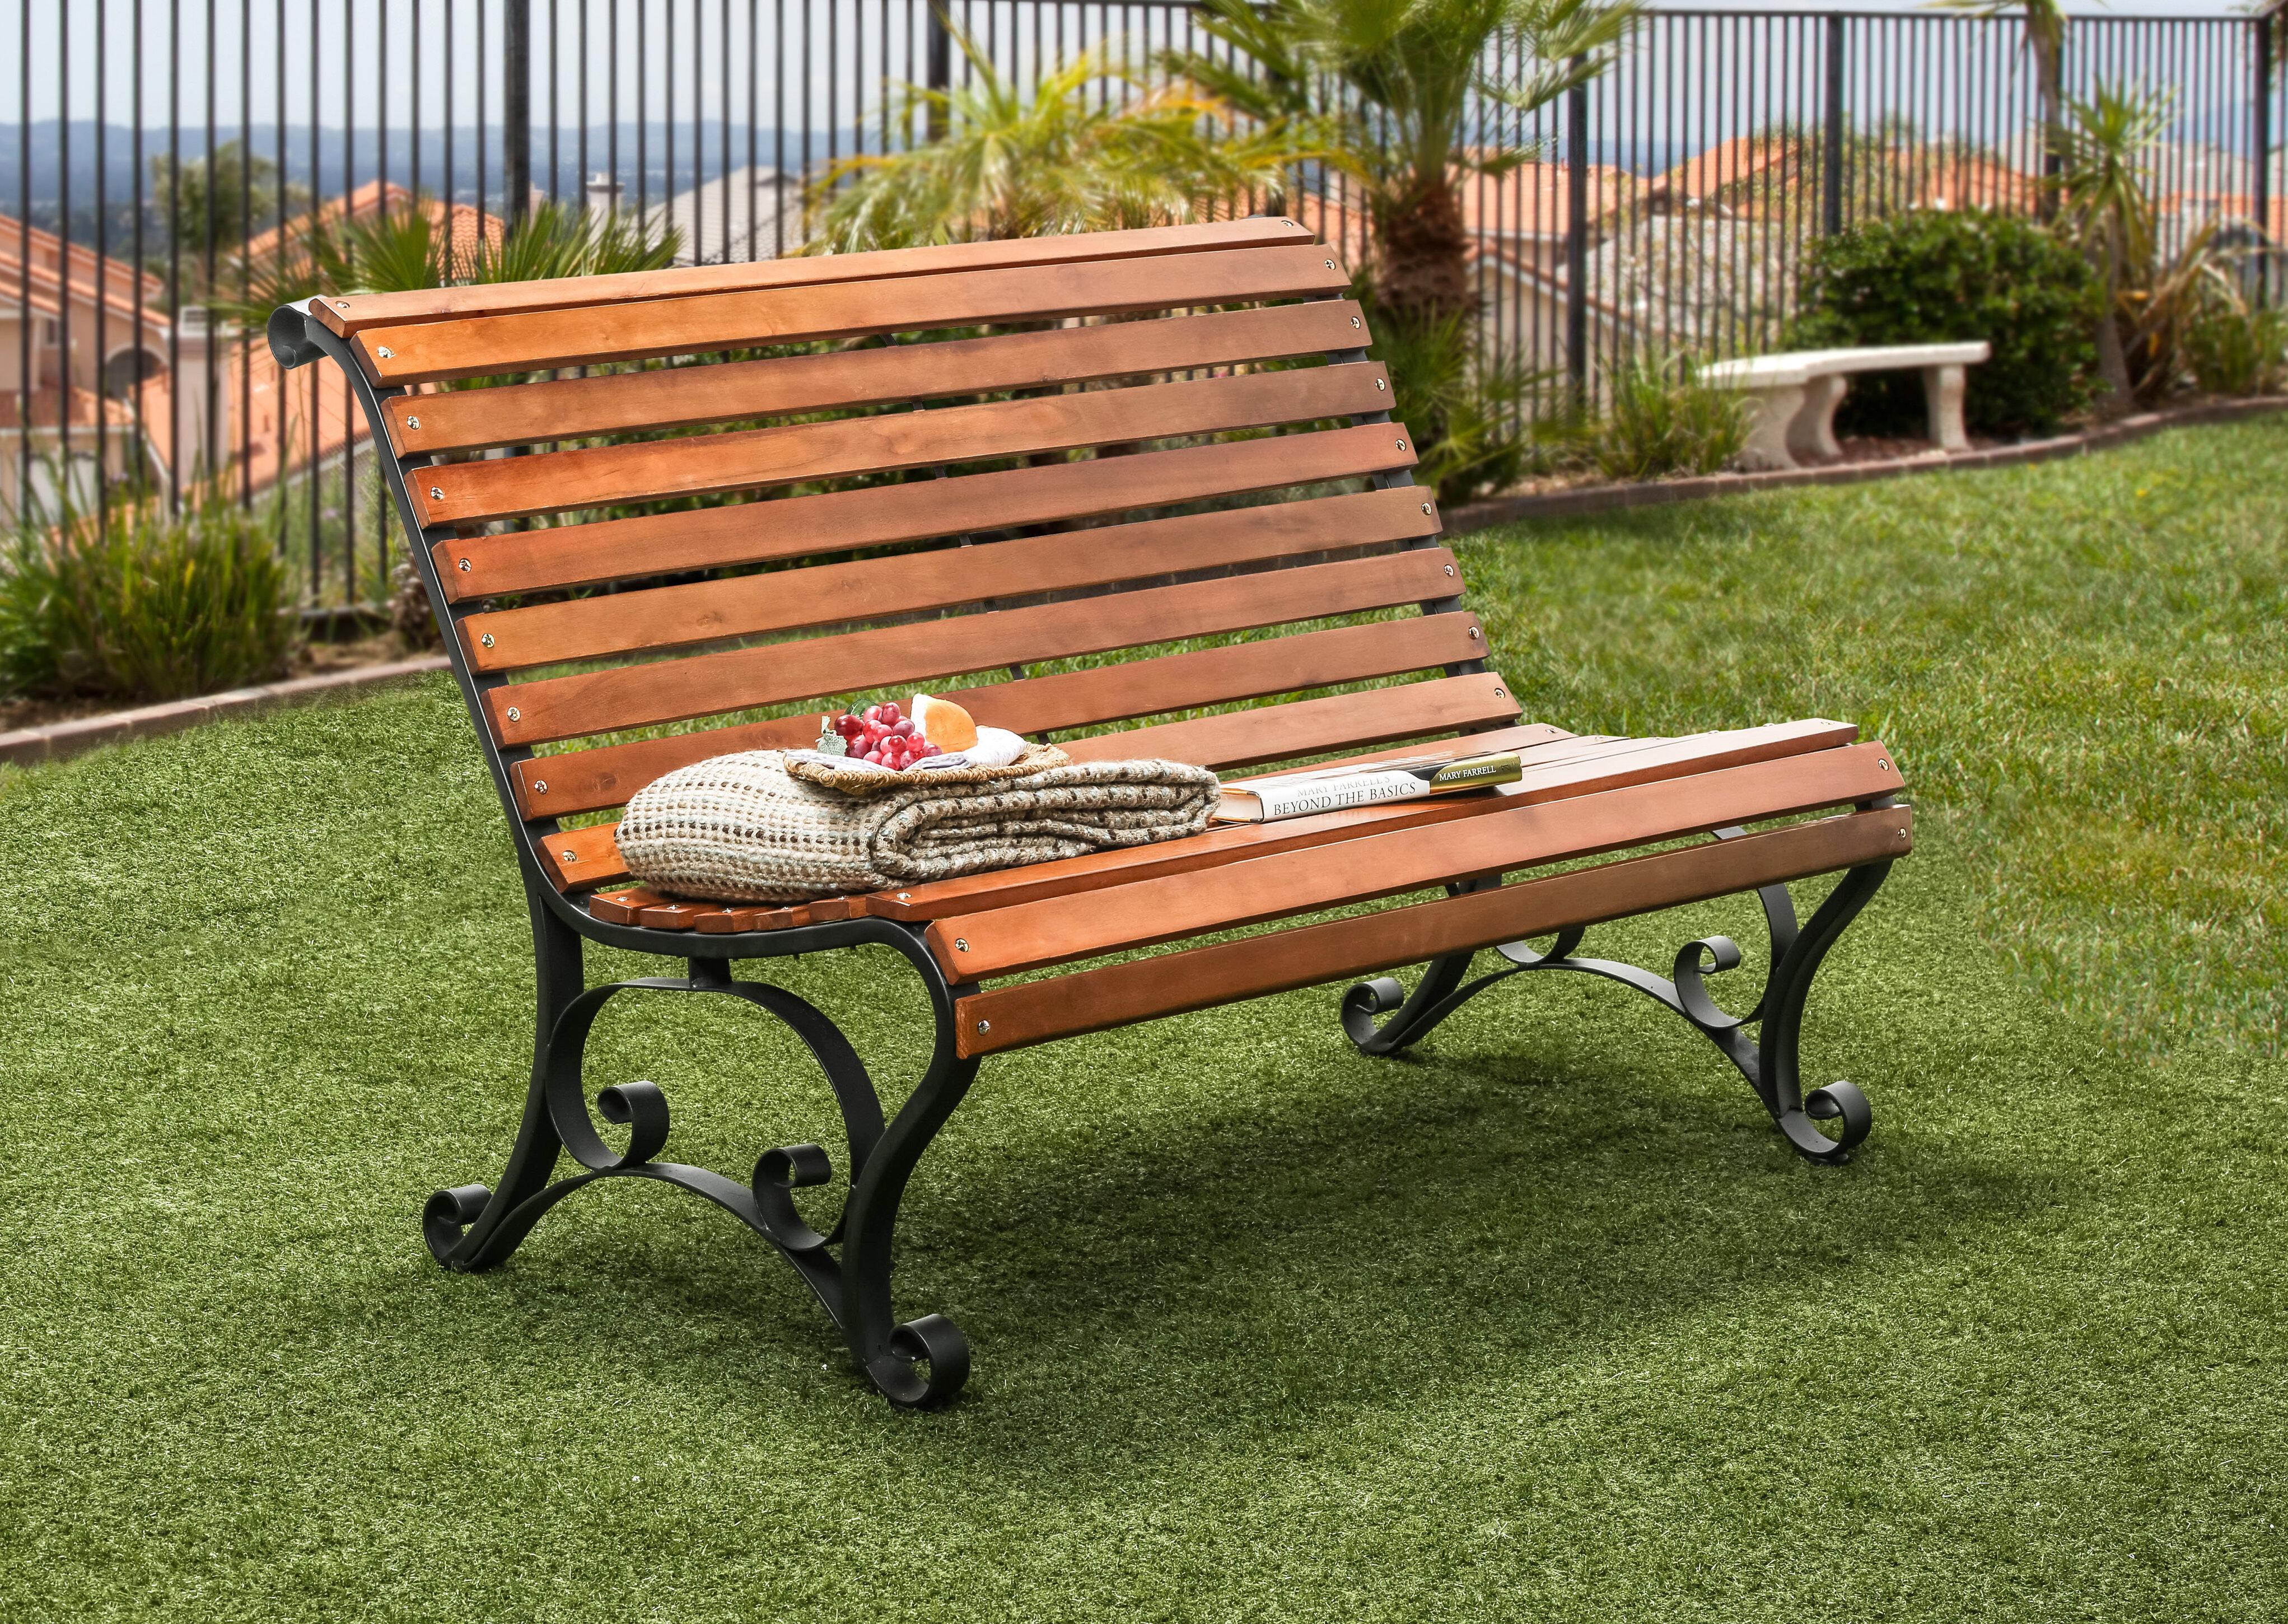 Peachy Simply Slatted Outdoor Iron Park Bench Creativecarmelina Interior Chair Design Creativecarmelinacom